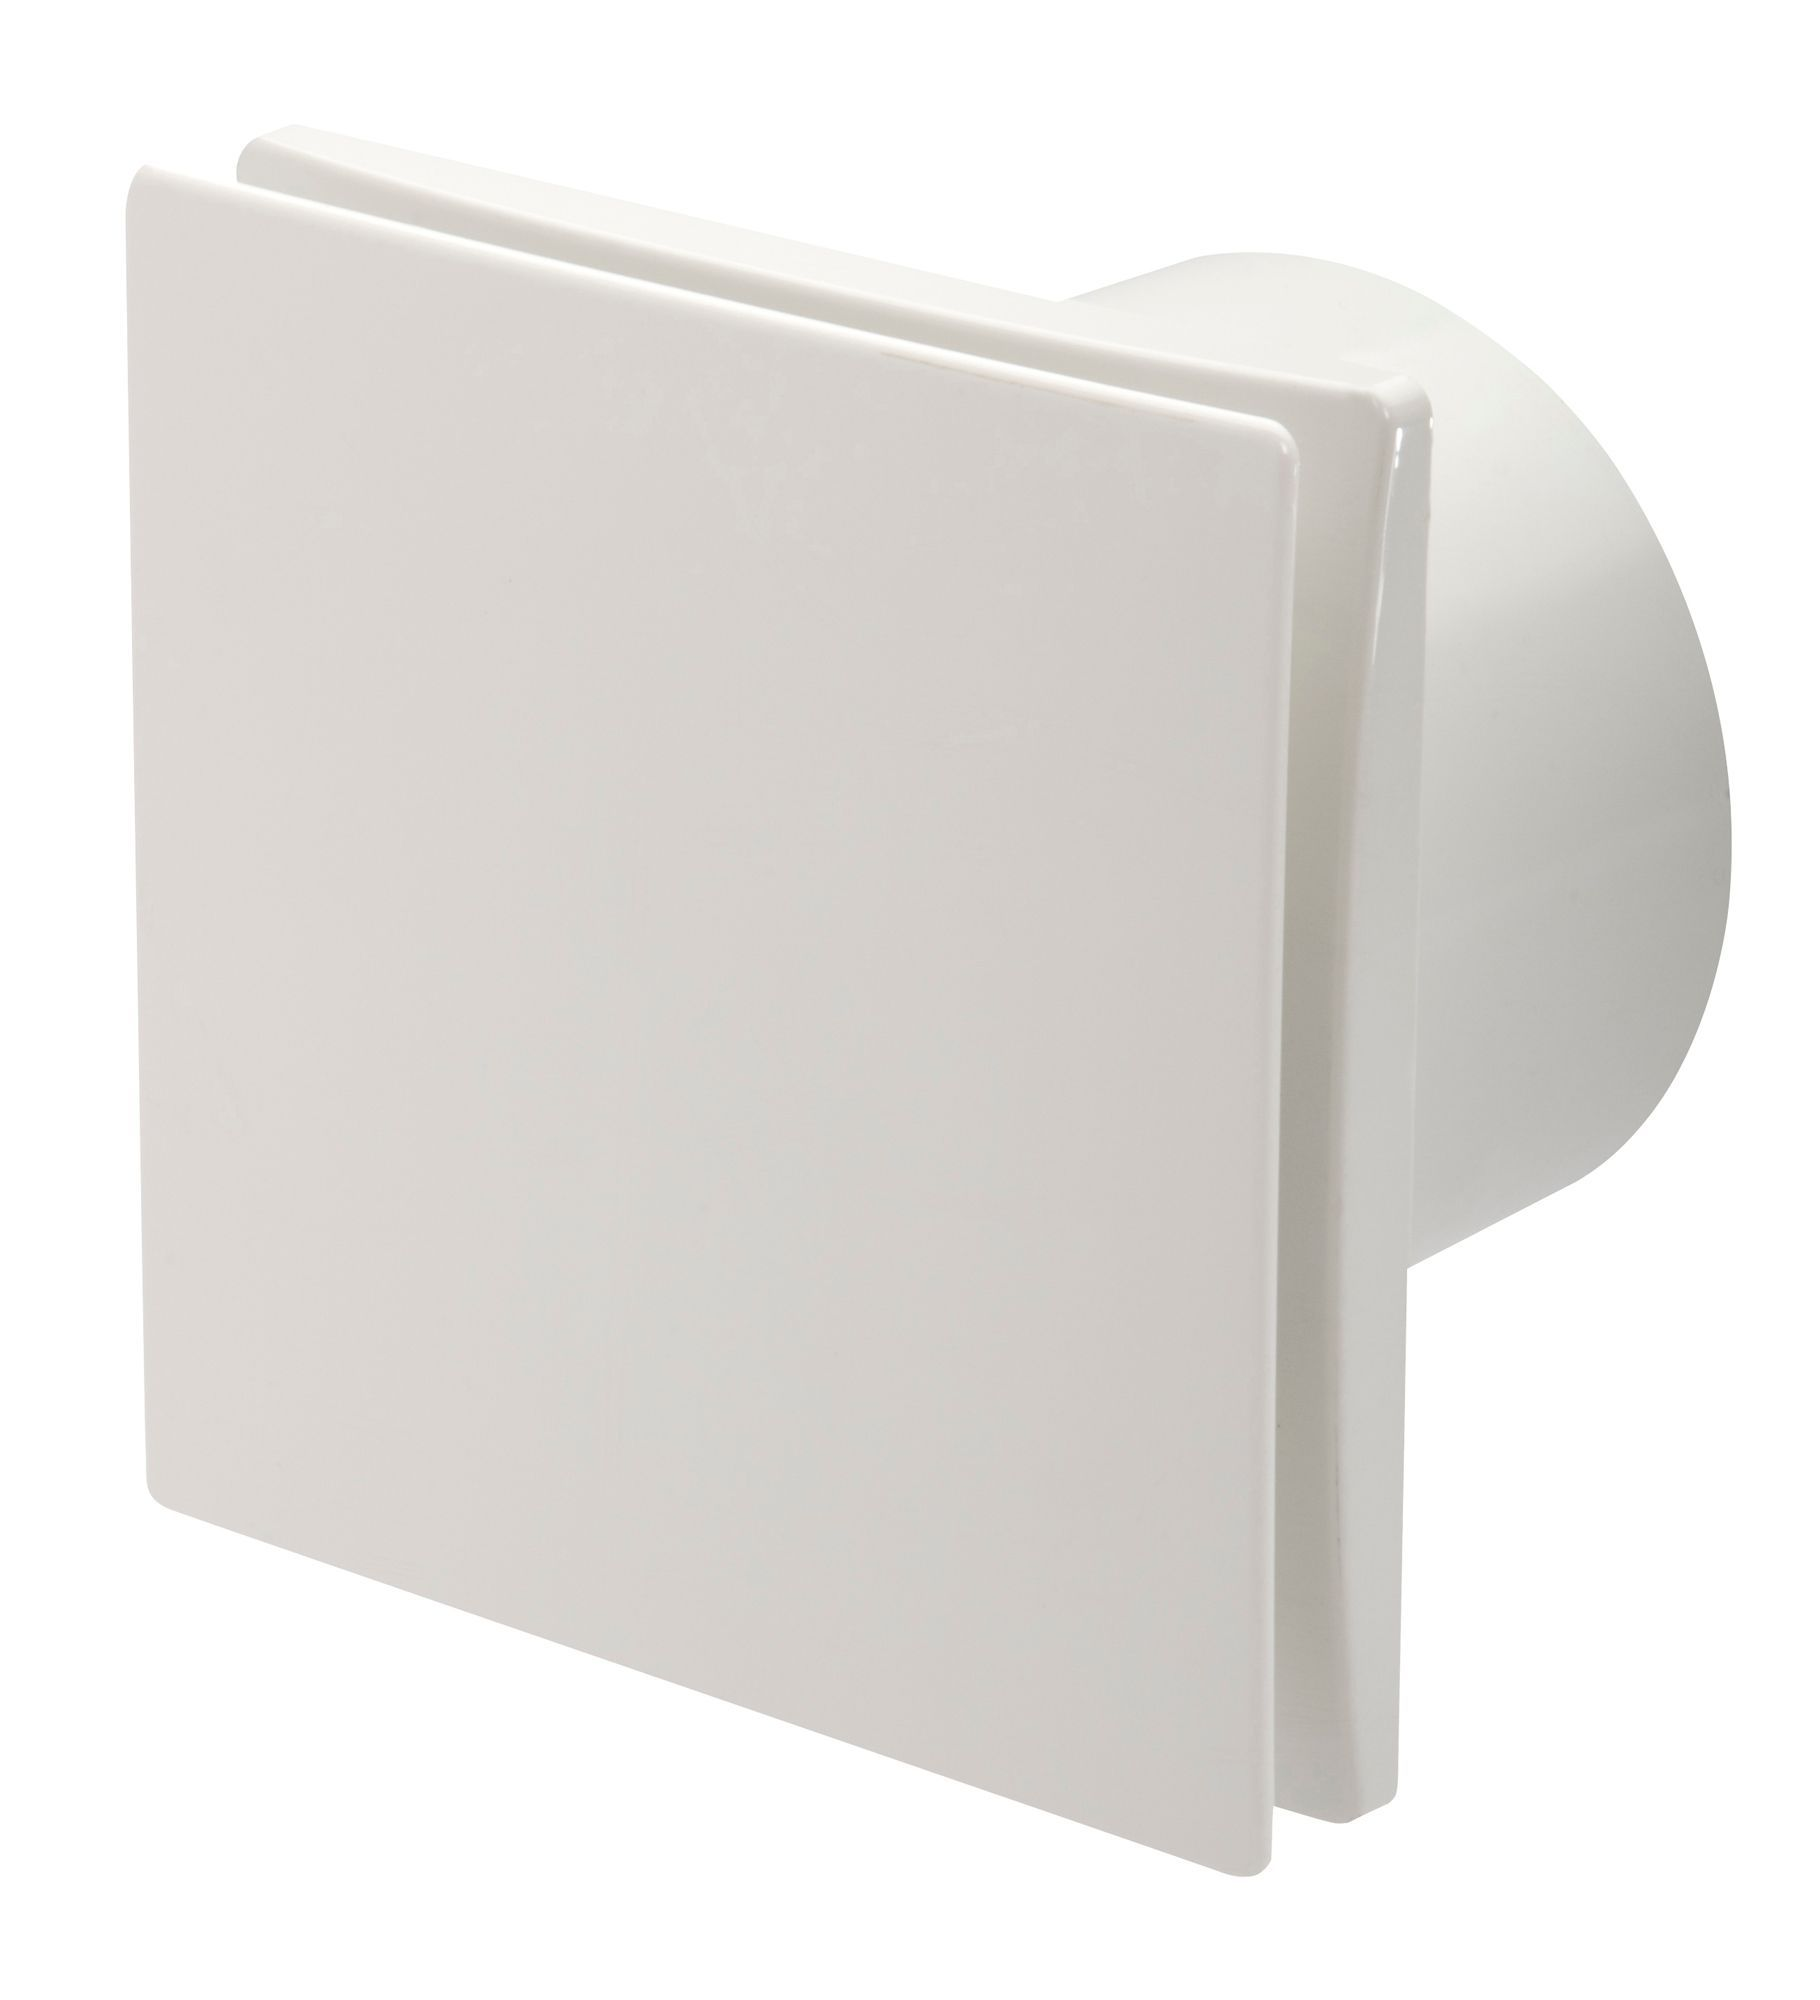 Vent Axia Impression Vimp100s Bathroom Extractor Fan 100 Mm Departments Diy Stylish Bathroom Extractor Fans Bathroom Extractor Fan